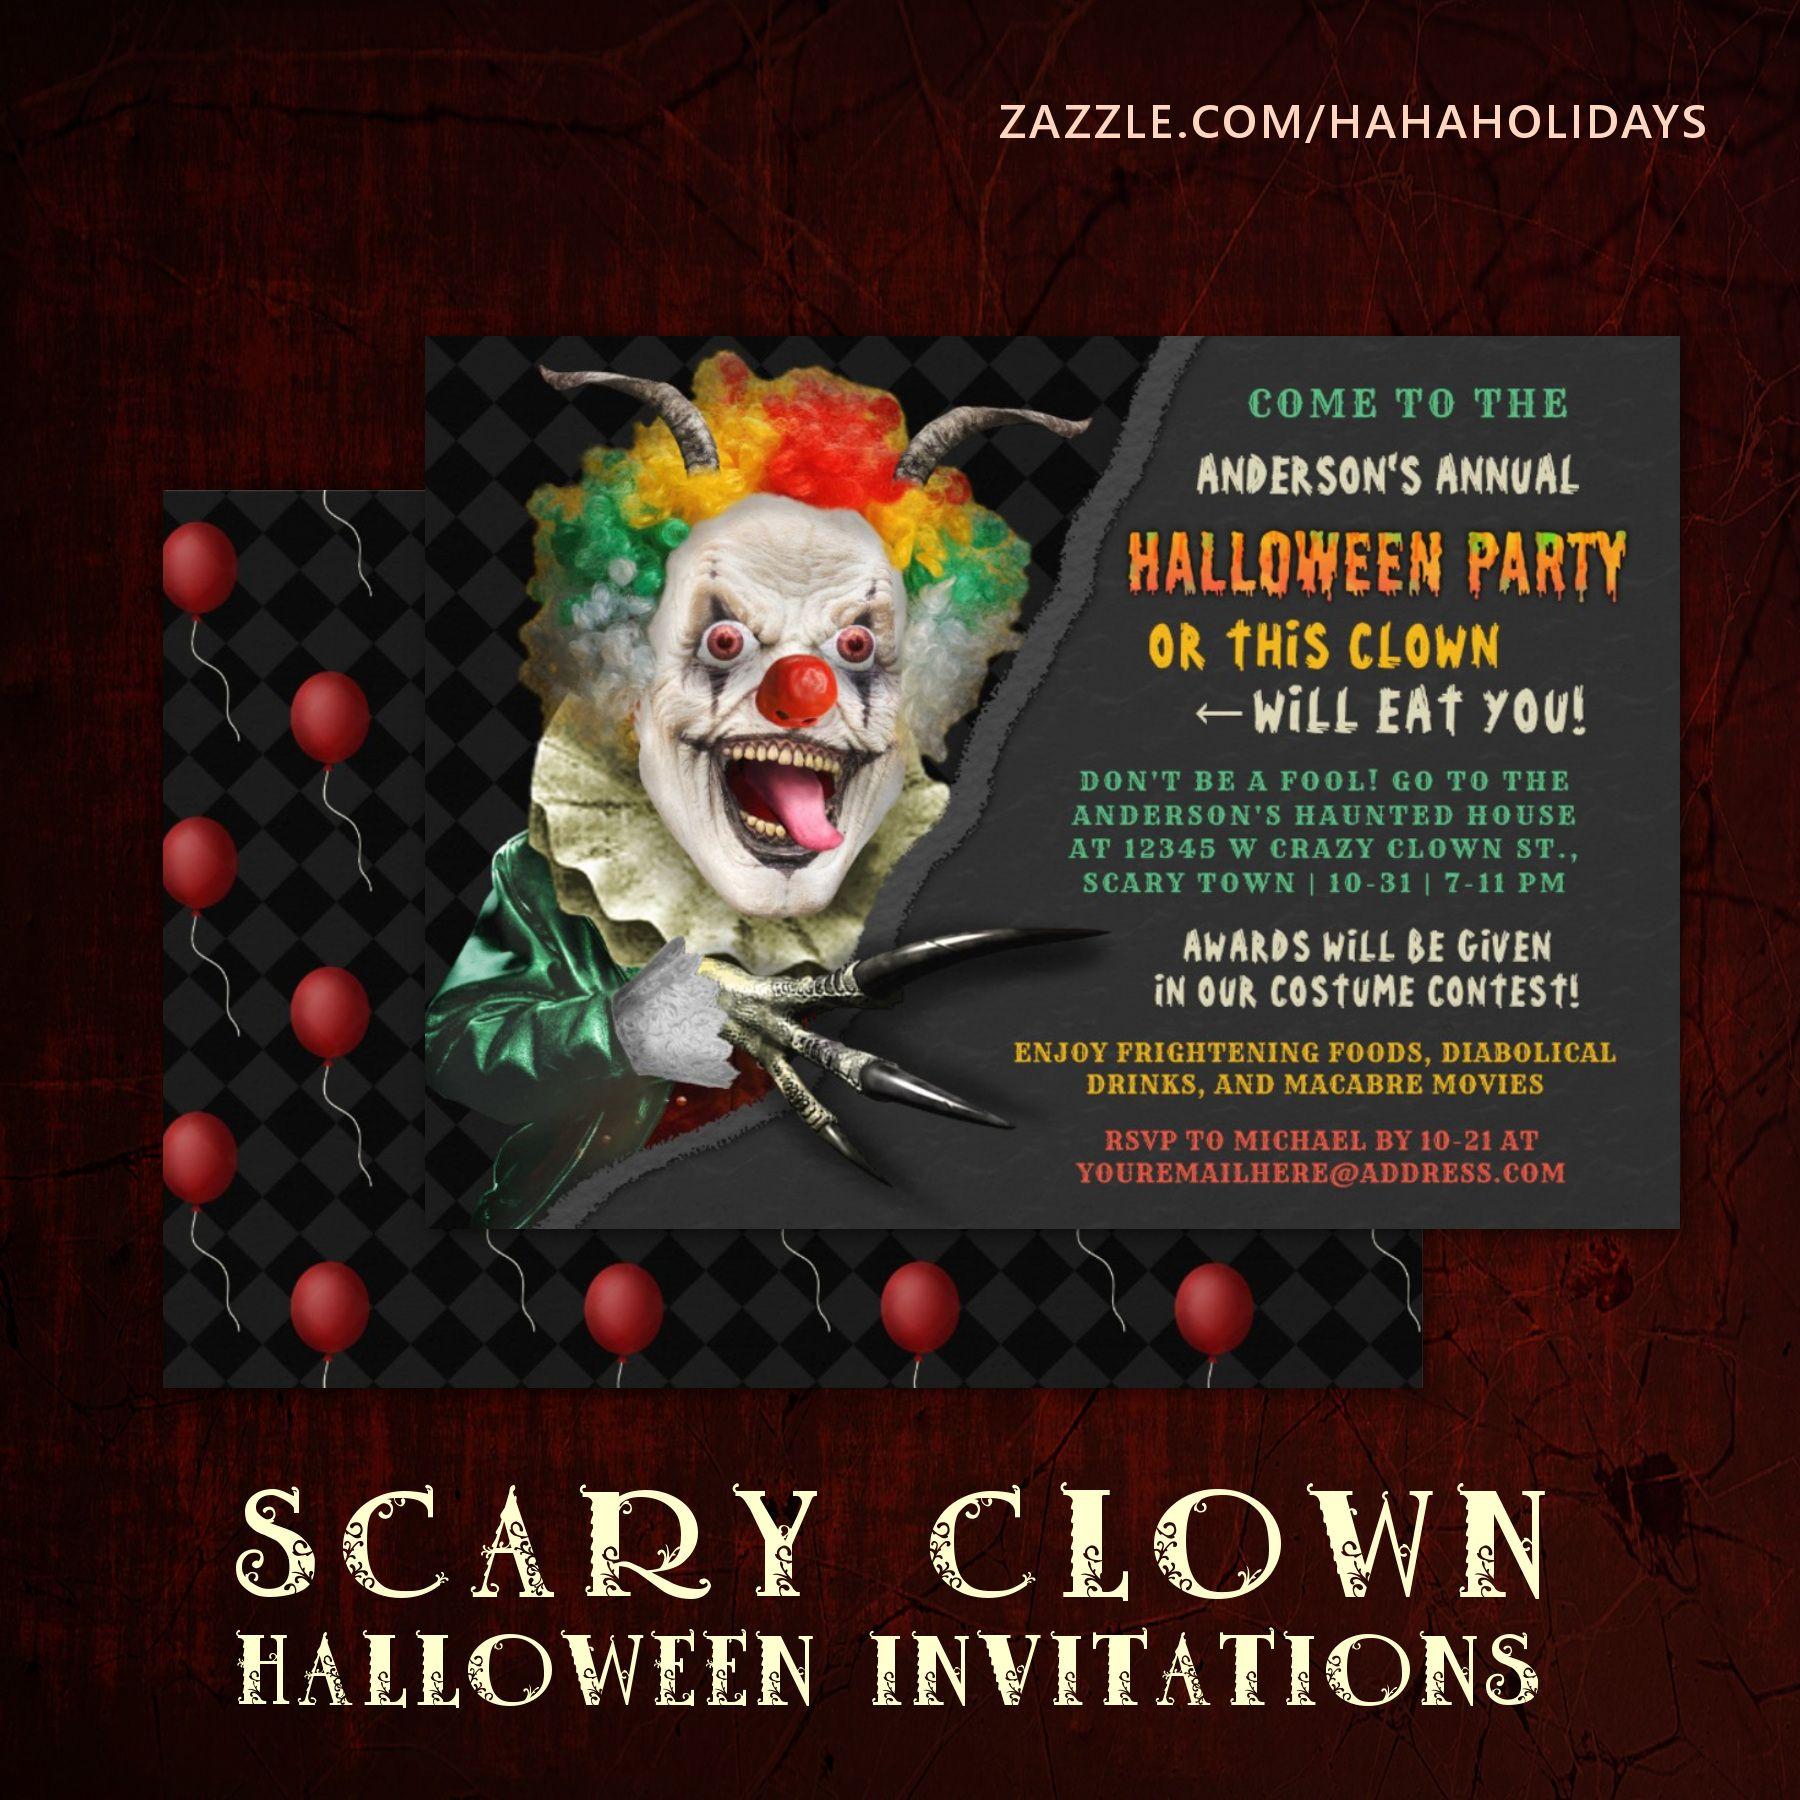 Halloween Creepy Clown Funny Adult Scary Party Invitation